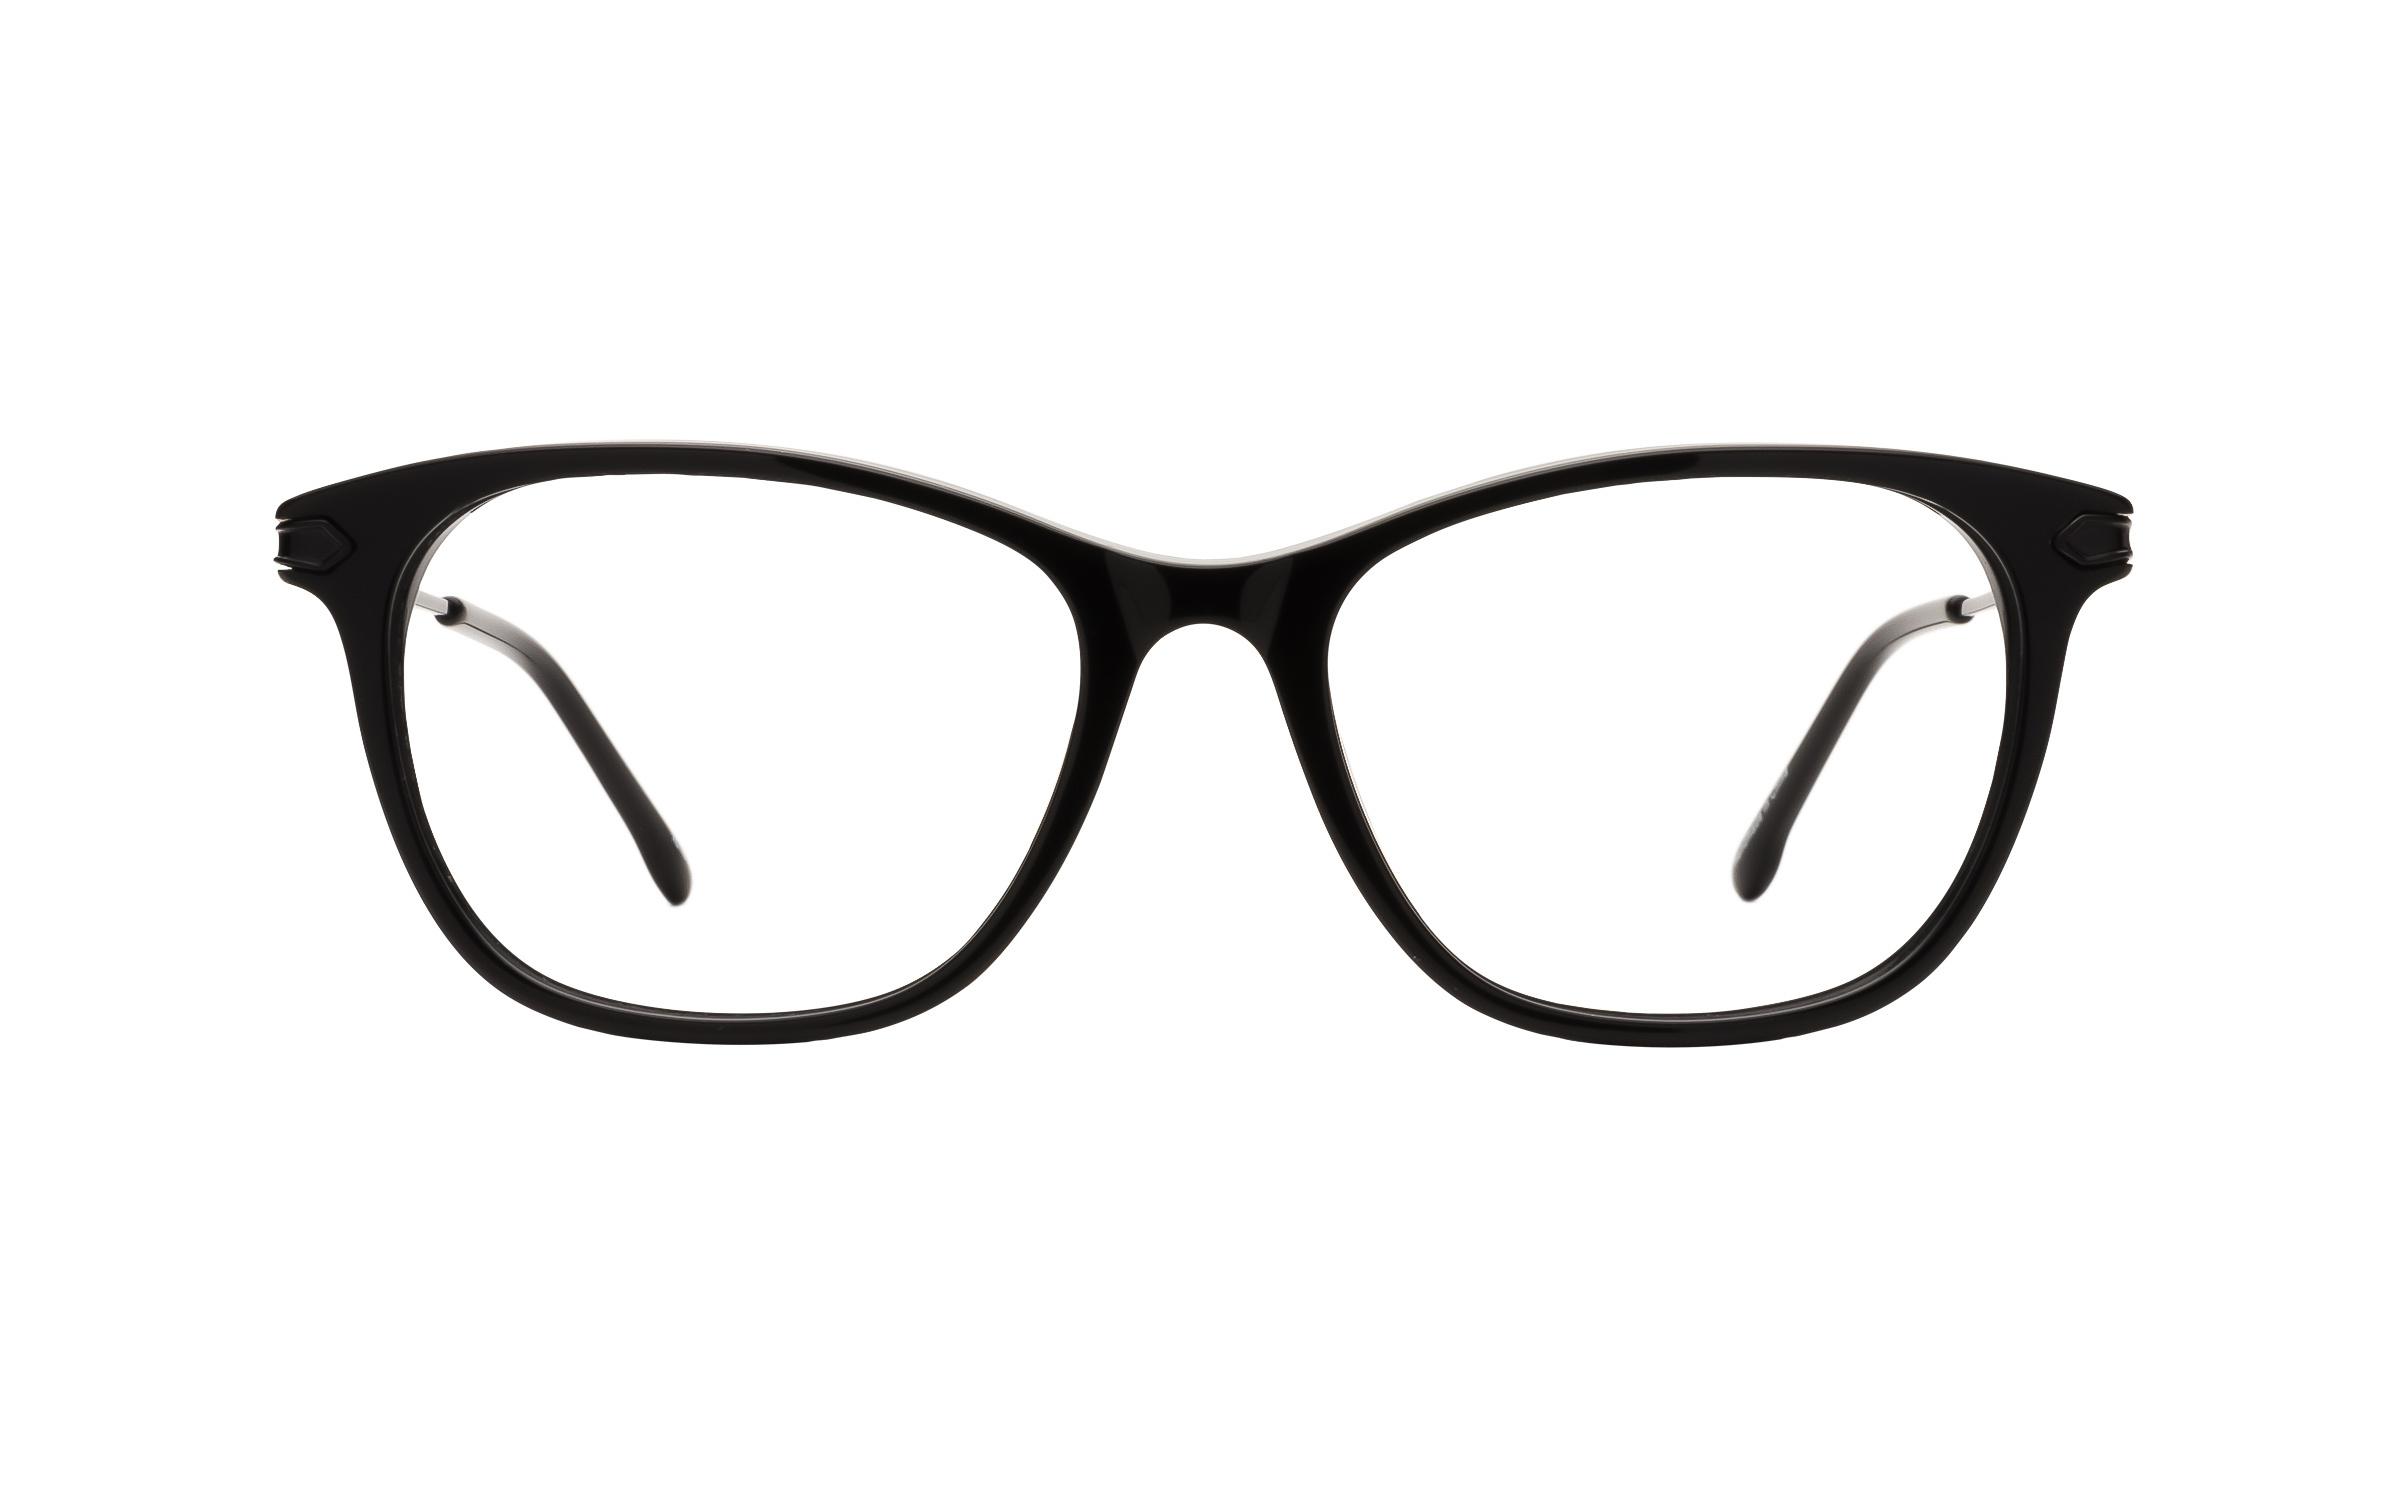 Derek_Cardigan_Womens_Glasses_DFrame_Black_AcetateMetal_Online_Coastal